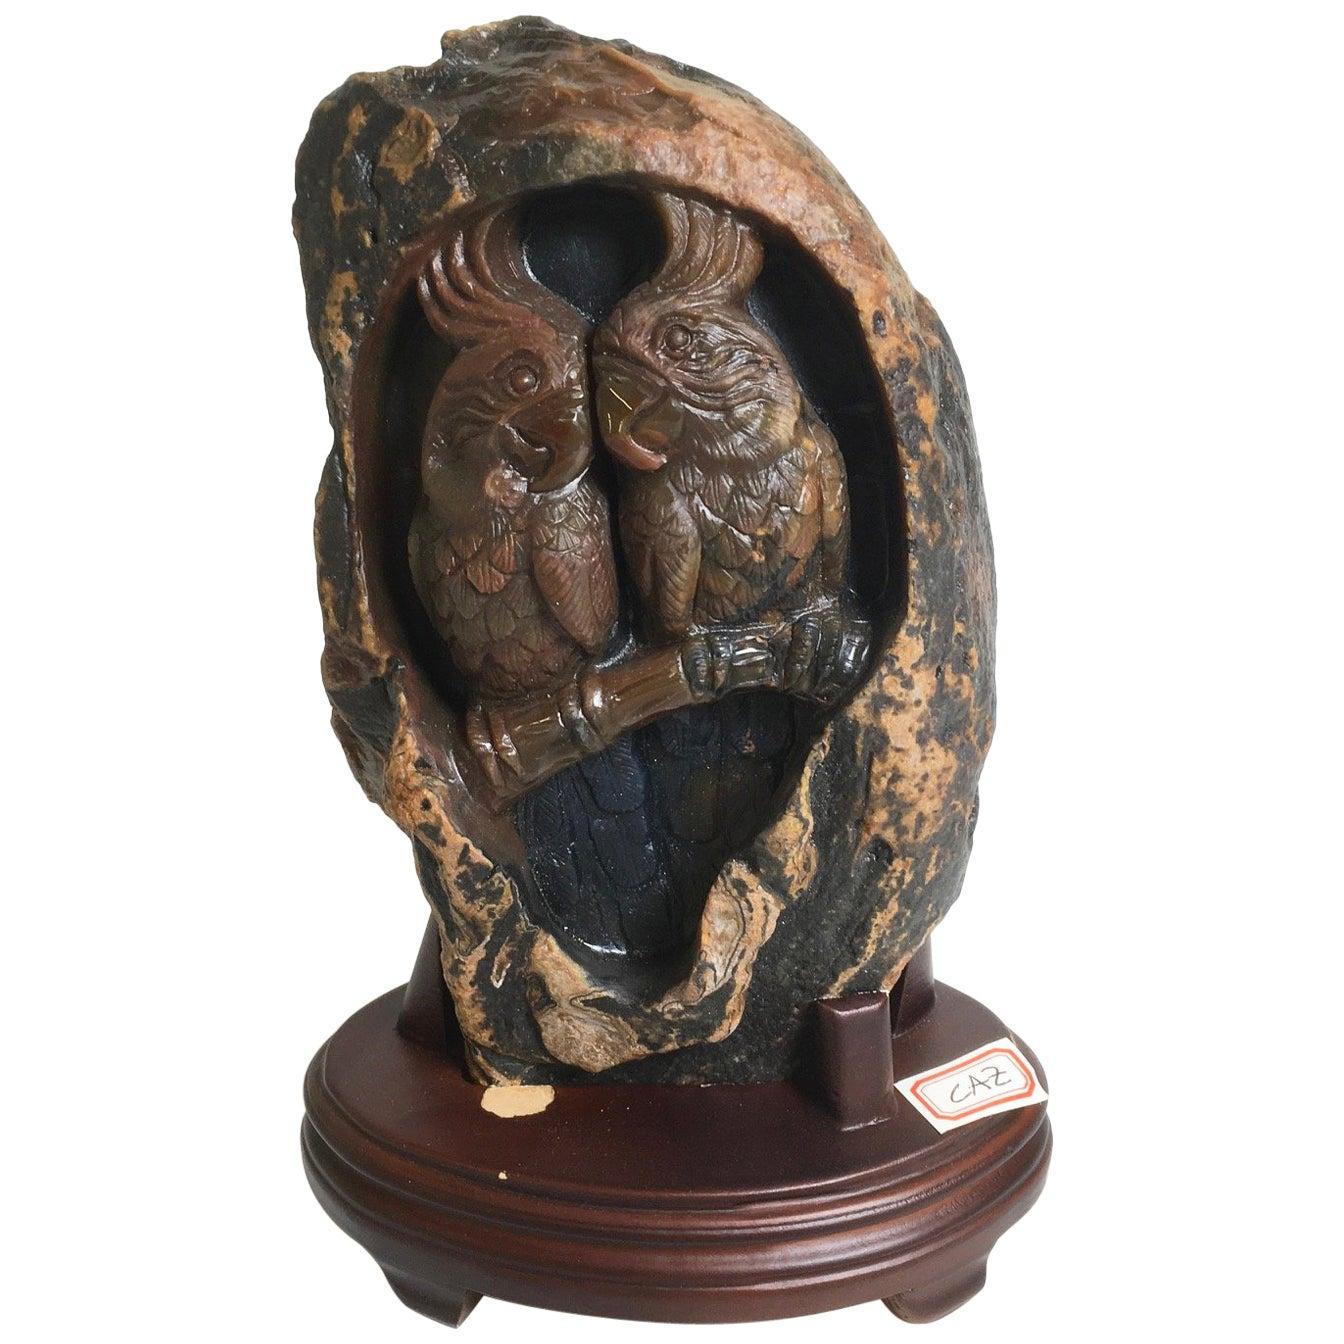 Beautiful Carved Agate Sculpture